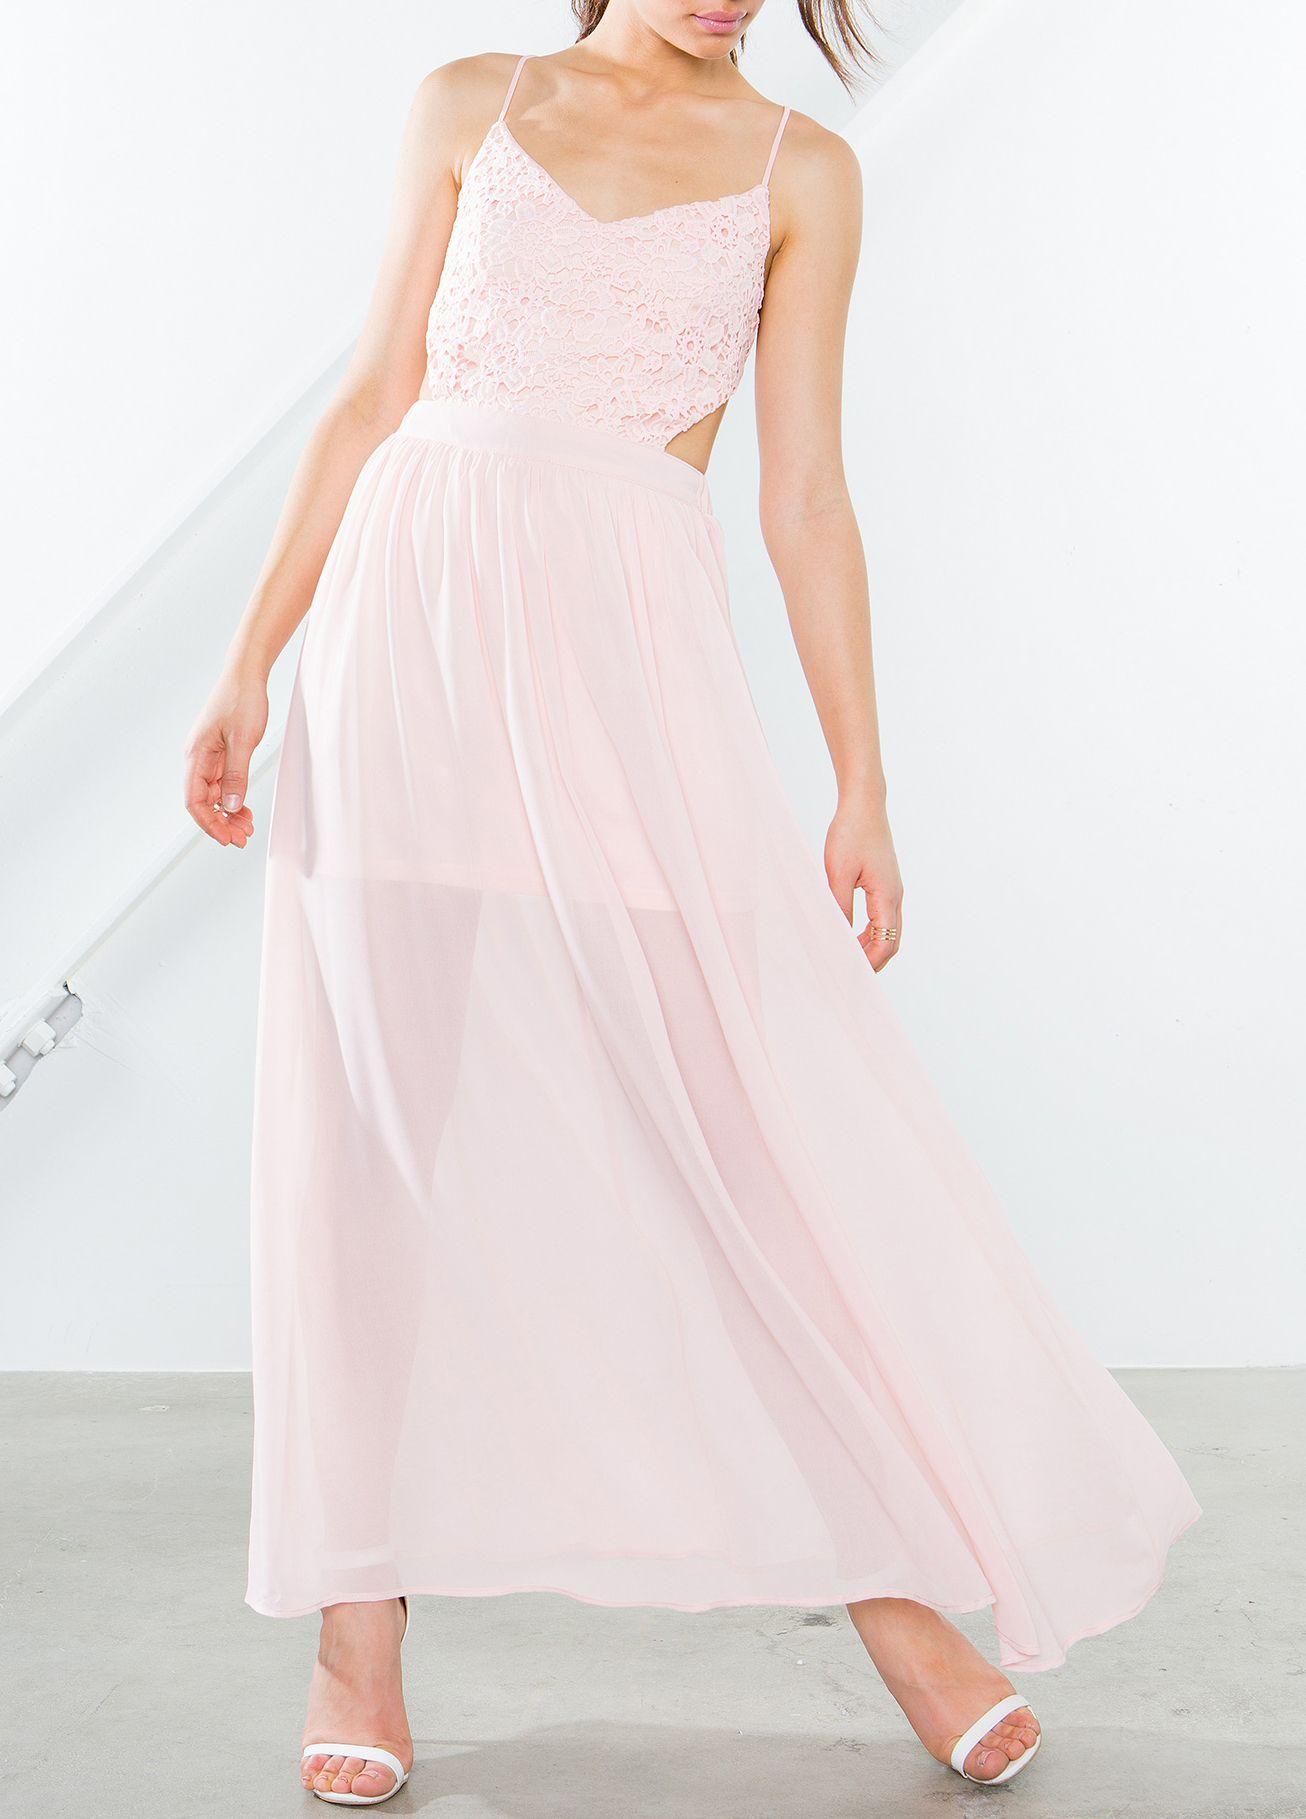 Pink Spaghetti Strap With Lace Maxi Dress 20.99